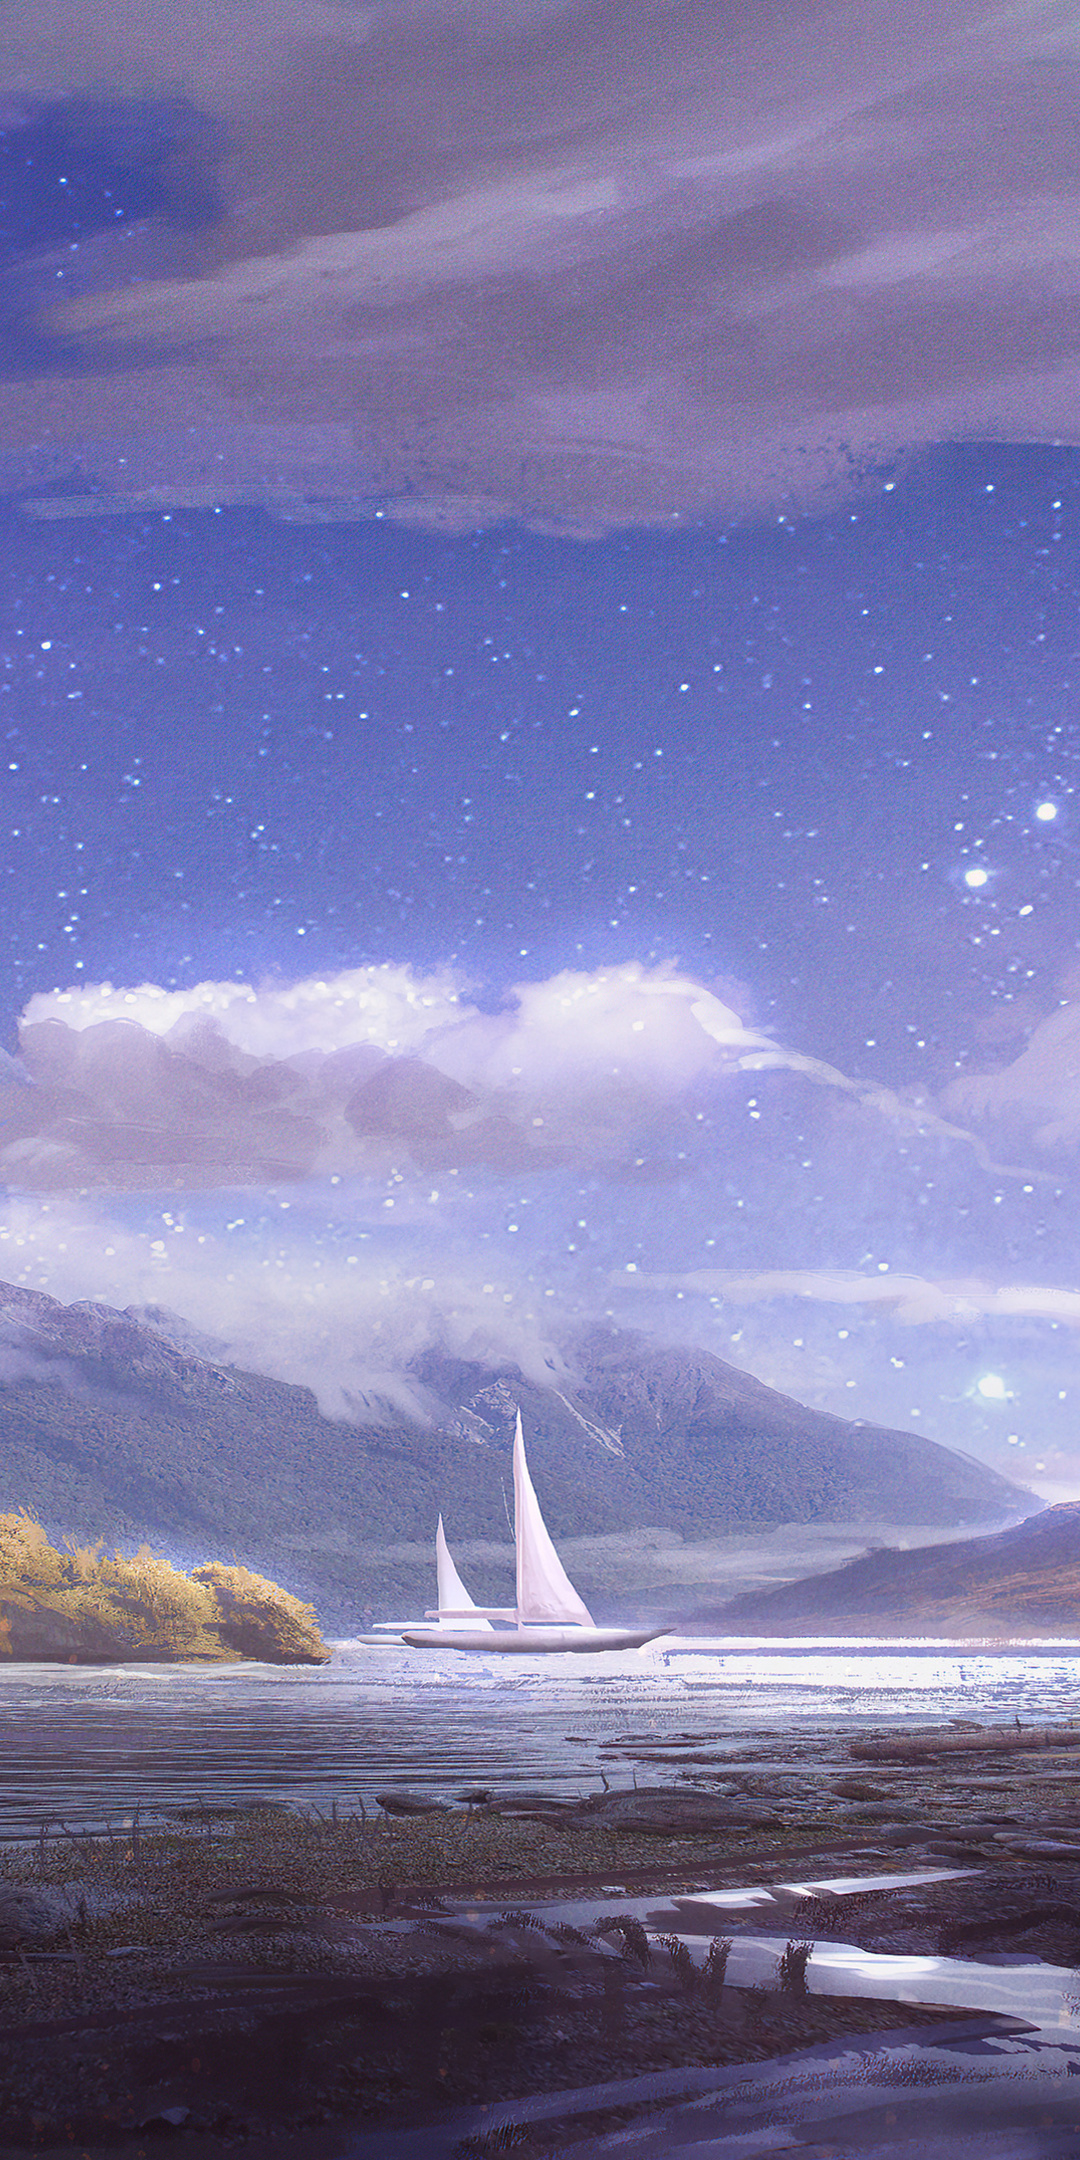 hevenia-boat-sky-mountains-4k-cg.jpg